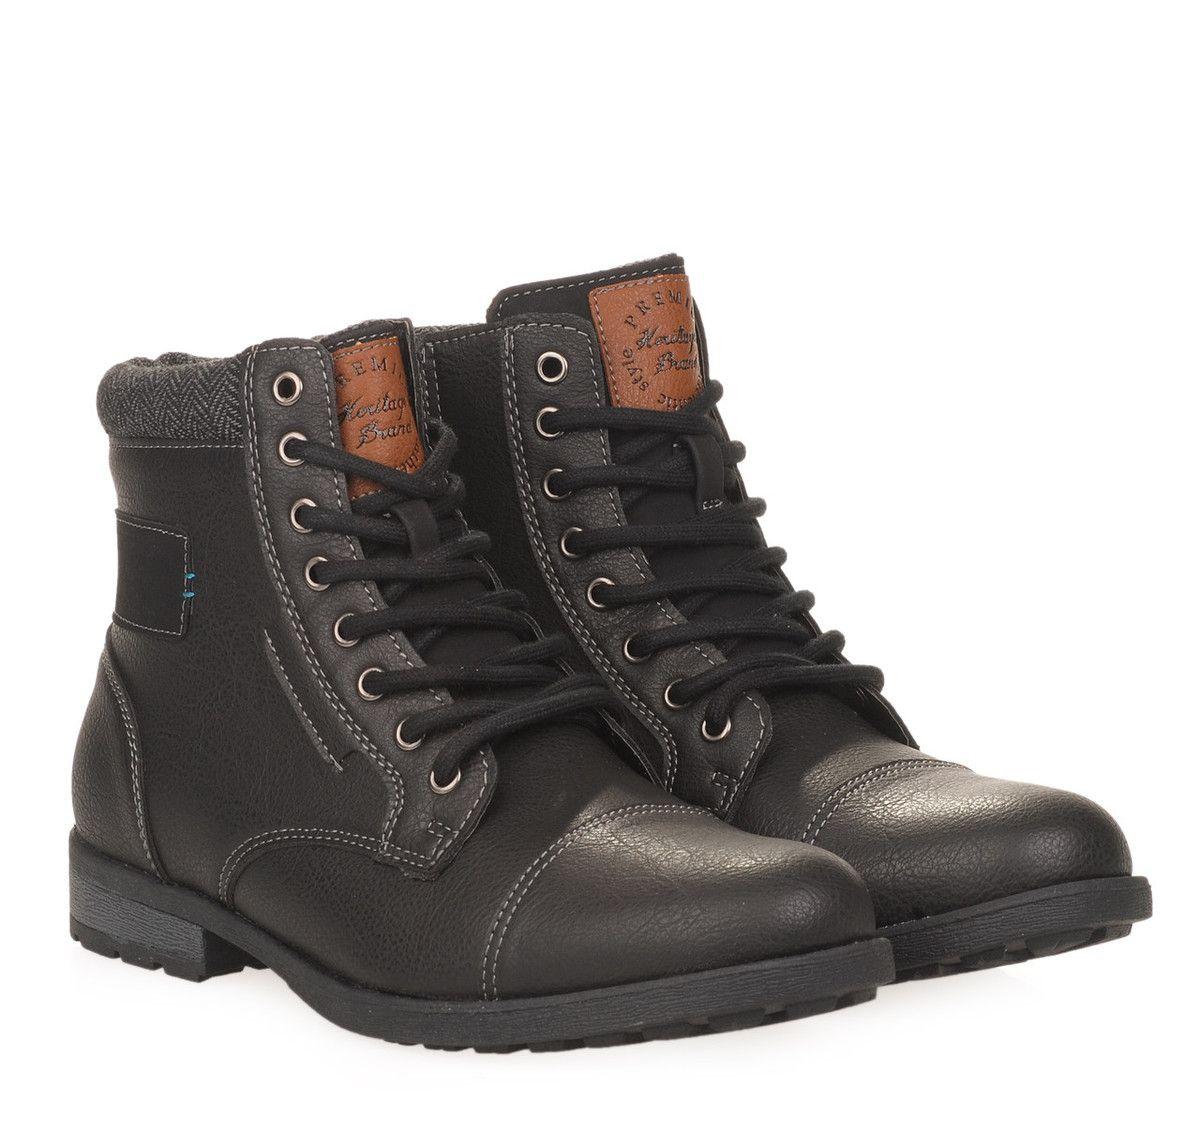 e4c269f6244 ΑΝΔΡΙΚΑ ΜΠΟΤΑΚΙΑ ΟΡΕΙΒΑΤΙΚΑ SPROX (BLACK) | Sagiakos Men Boots A/W ...